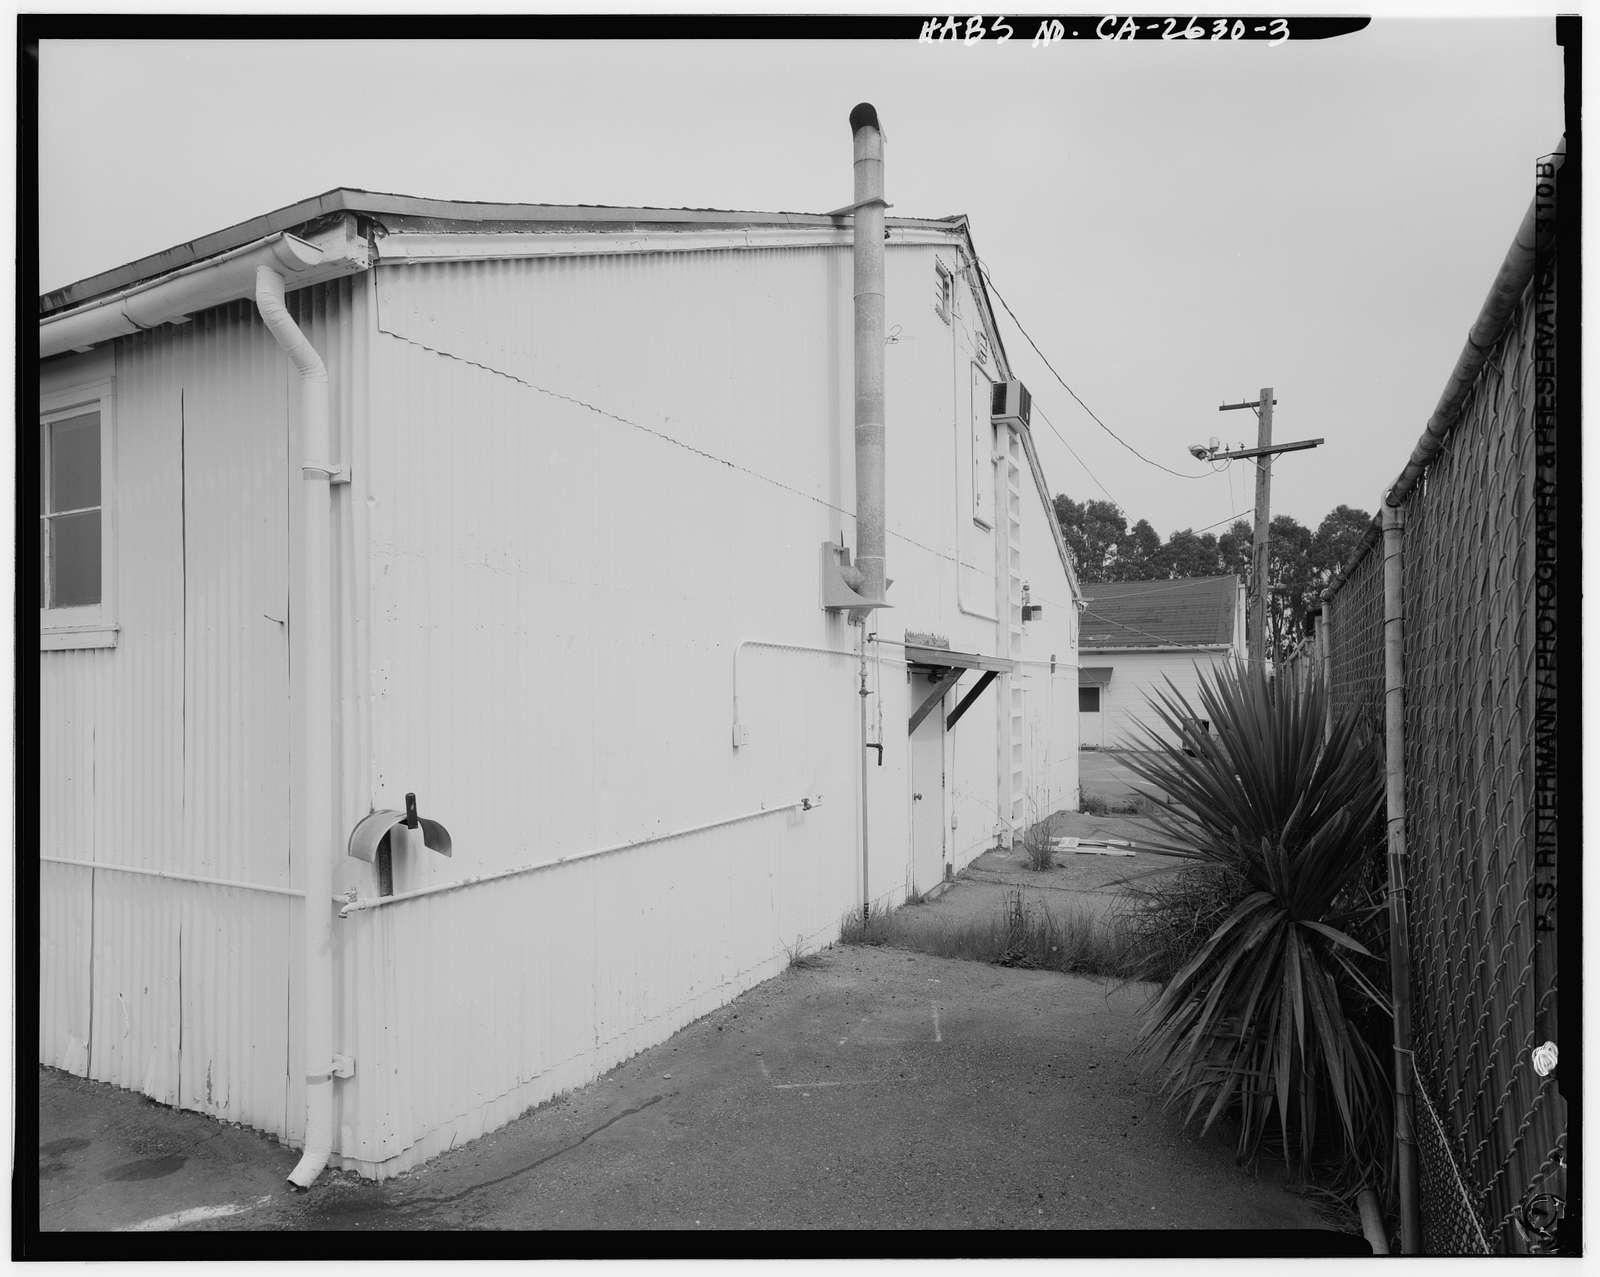 Presidio of San Francisco, Electrical Shop, Crissy Field North cantonment, San Francisco, San Francisco County, CA